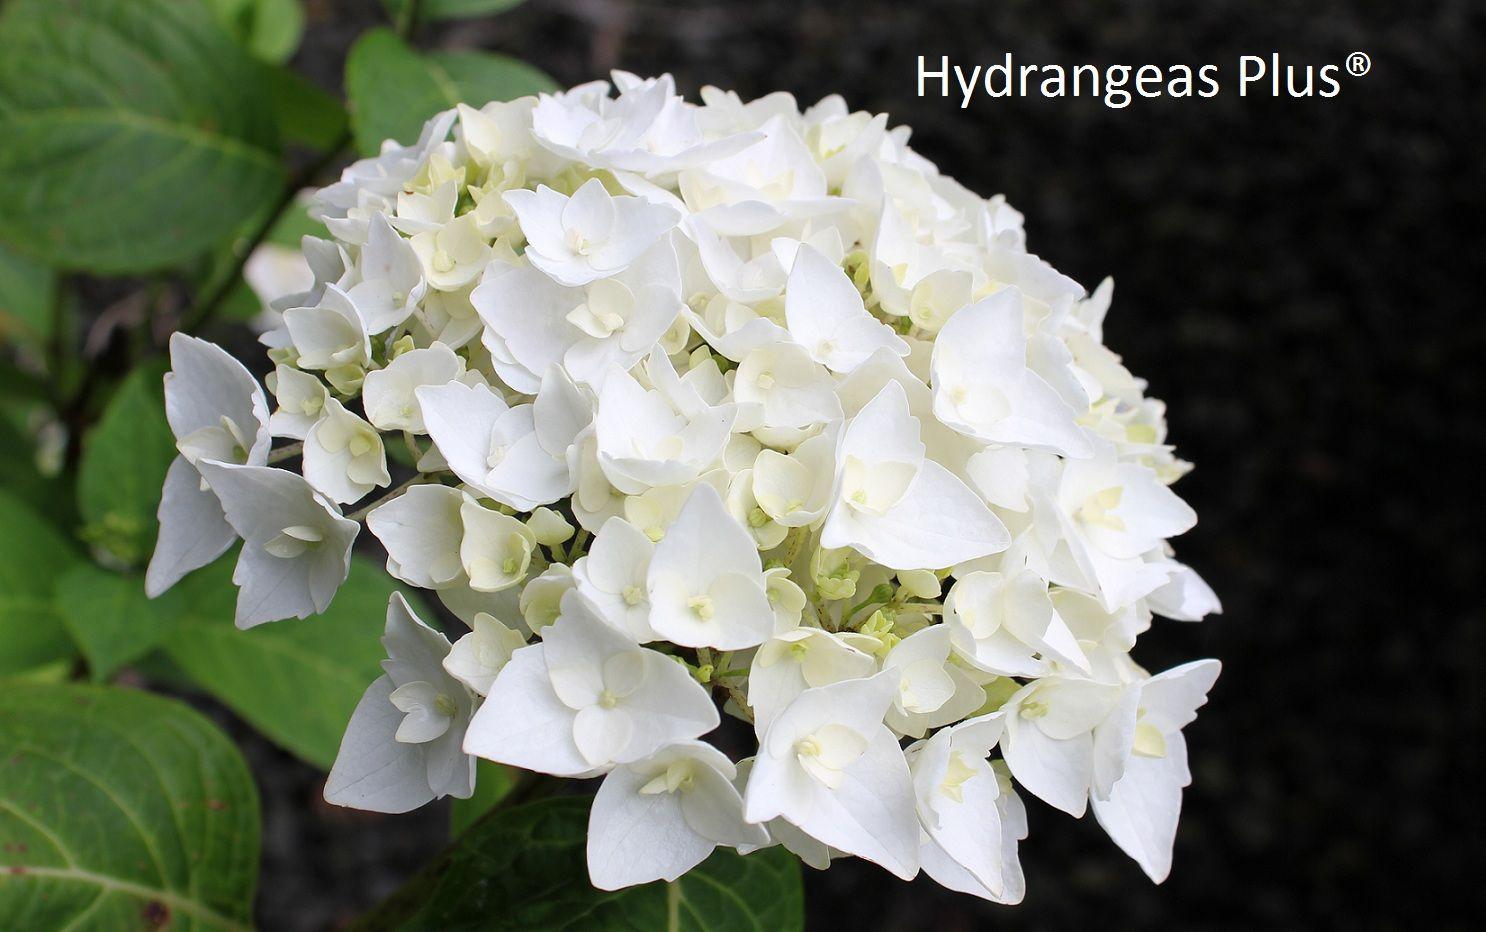 Hydrangea Macrophylla Blushing Bride Blushing Bride Hydrangea Hydrangea Not Blooming Hydrangea Macrophylla